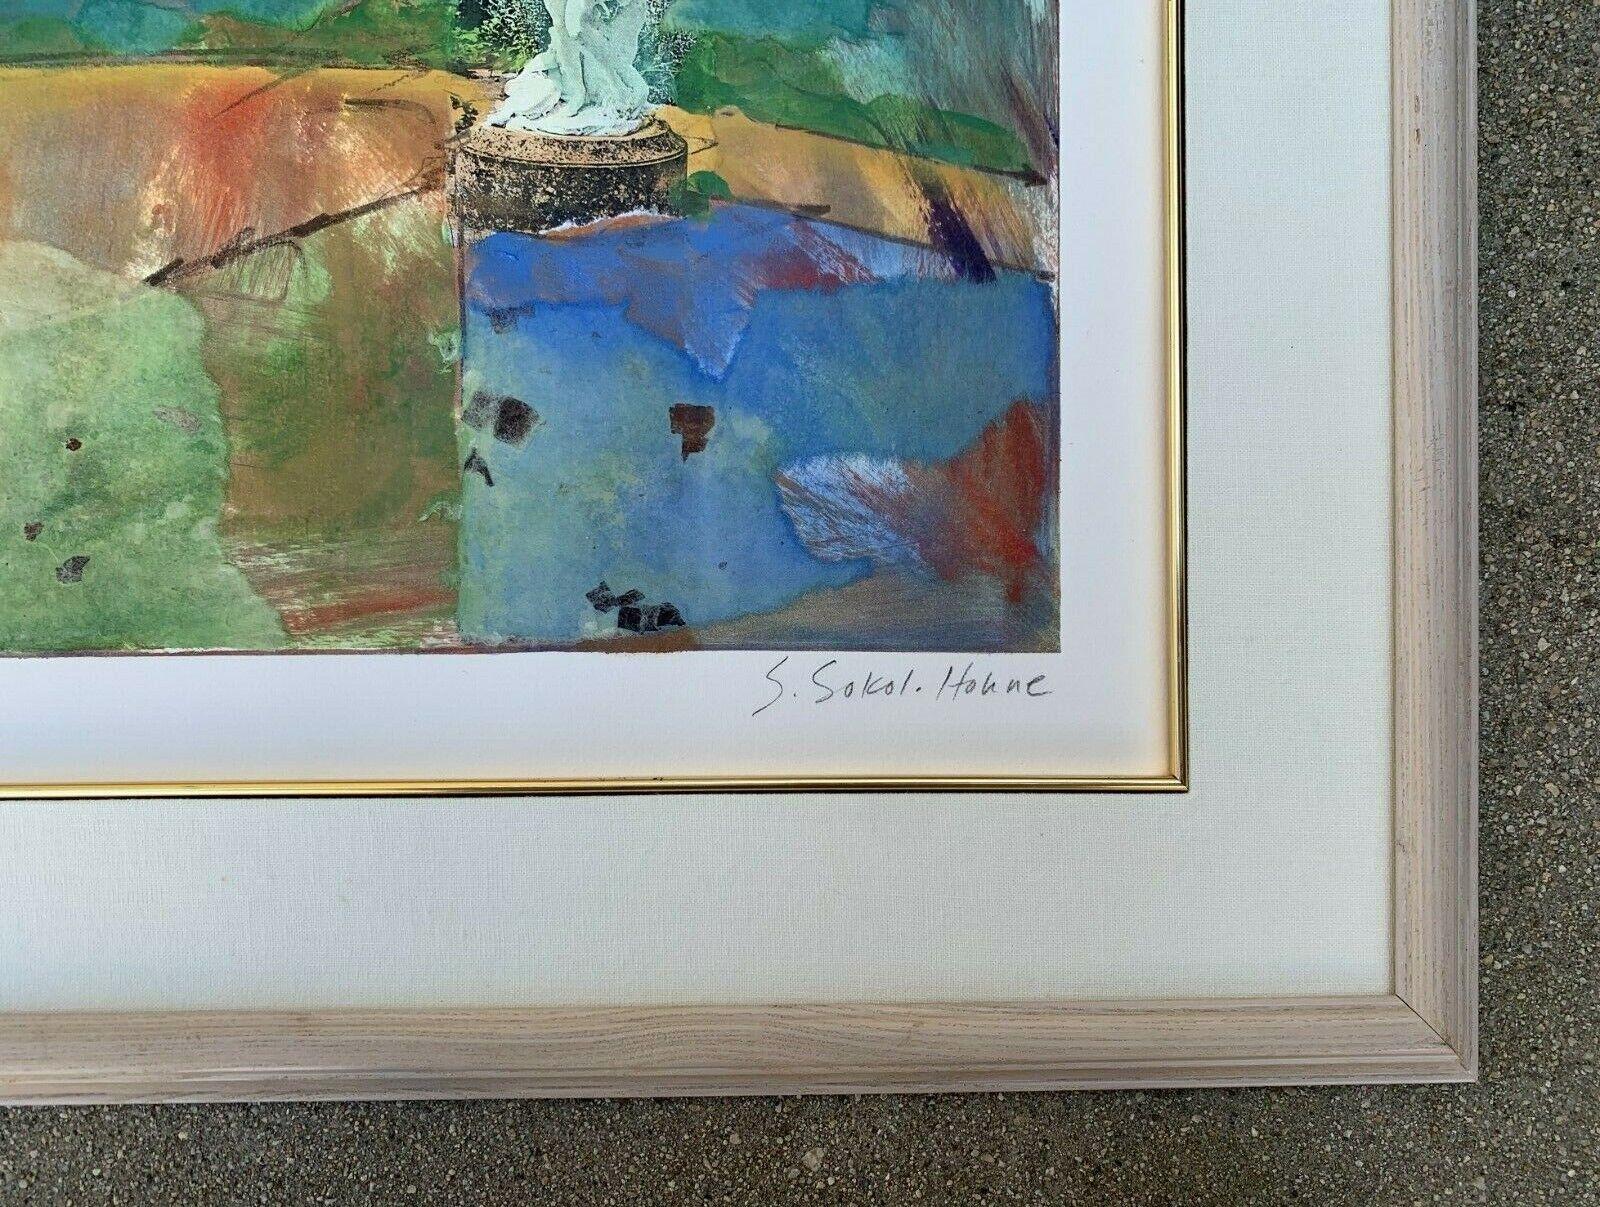 STARLIE SOKOL- HOHNE b.1958- ORIGINAL MIXED MEDIA ABSTRACT ART WORK ON PAPER - $350.00